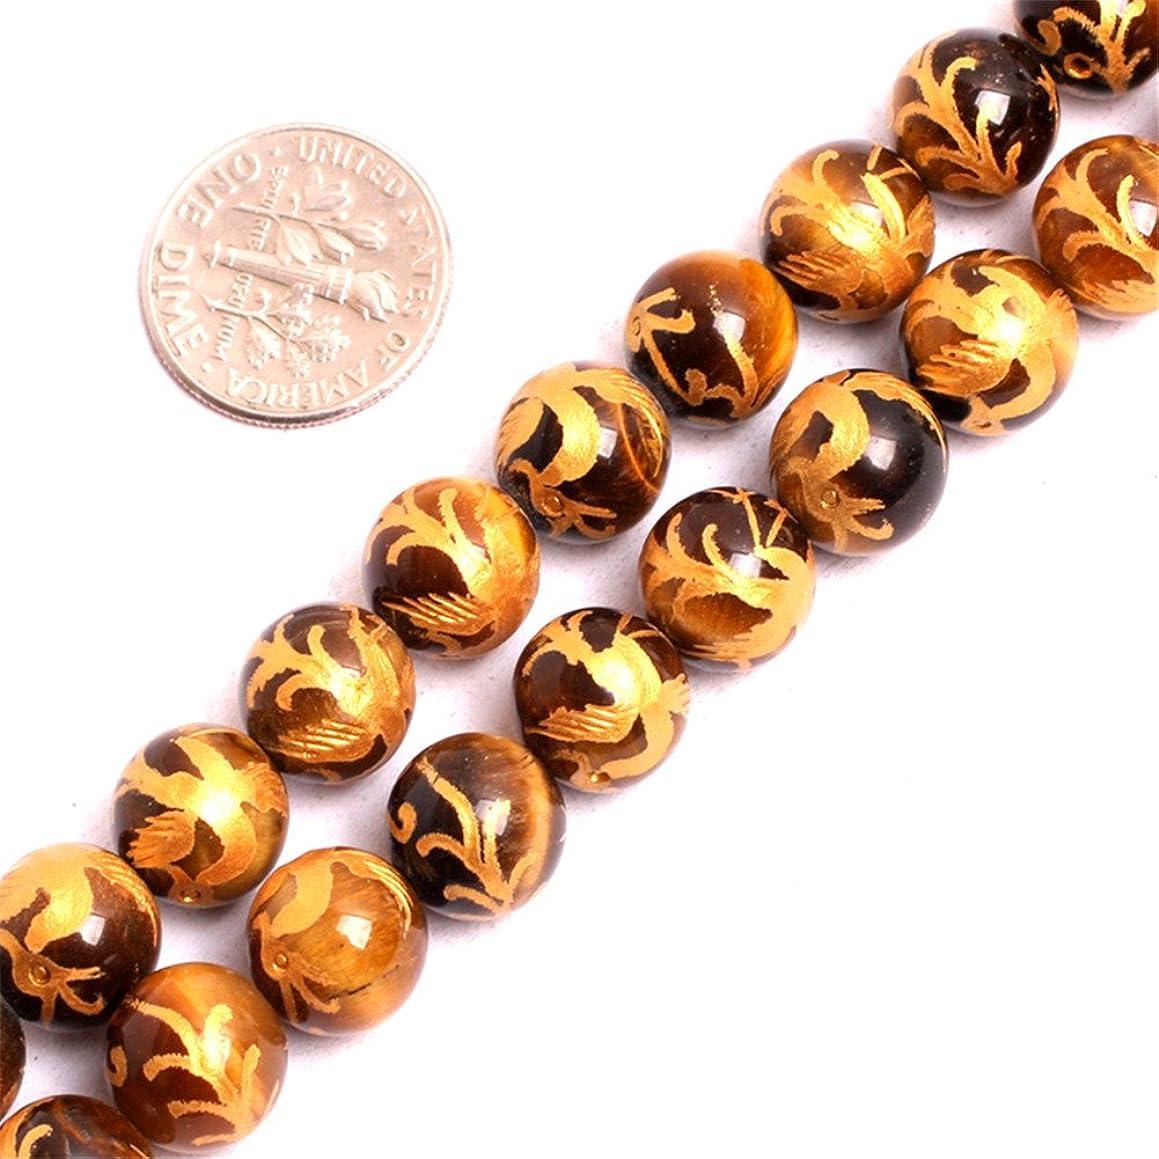 Tiger Eye Beads for Jewelry Making Natural Semi Precious Gemstone 10mm Zhuque Phonix Mala Strand 15